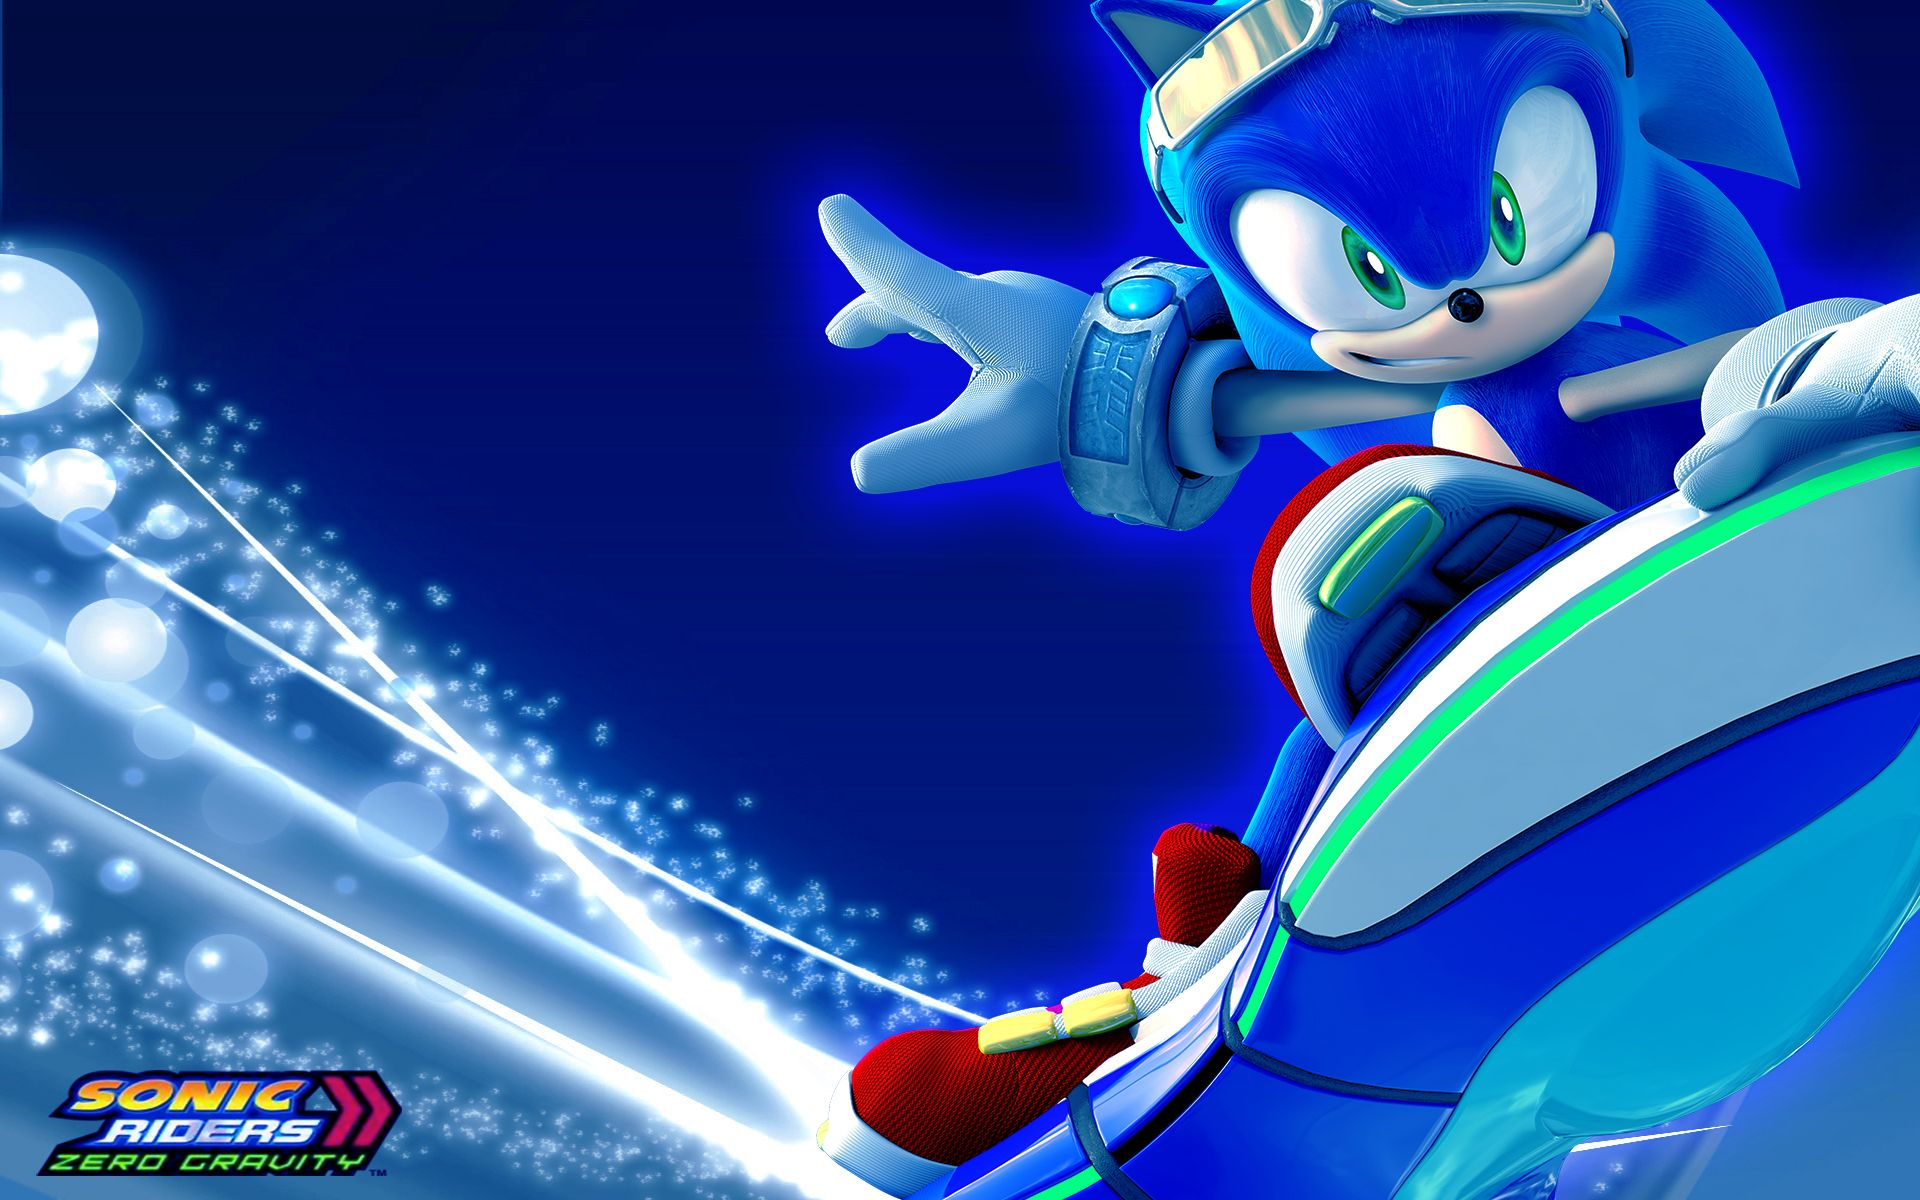 Sonic Wallpaper Gadgetssaqibsomal 2016 01